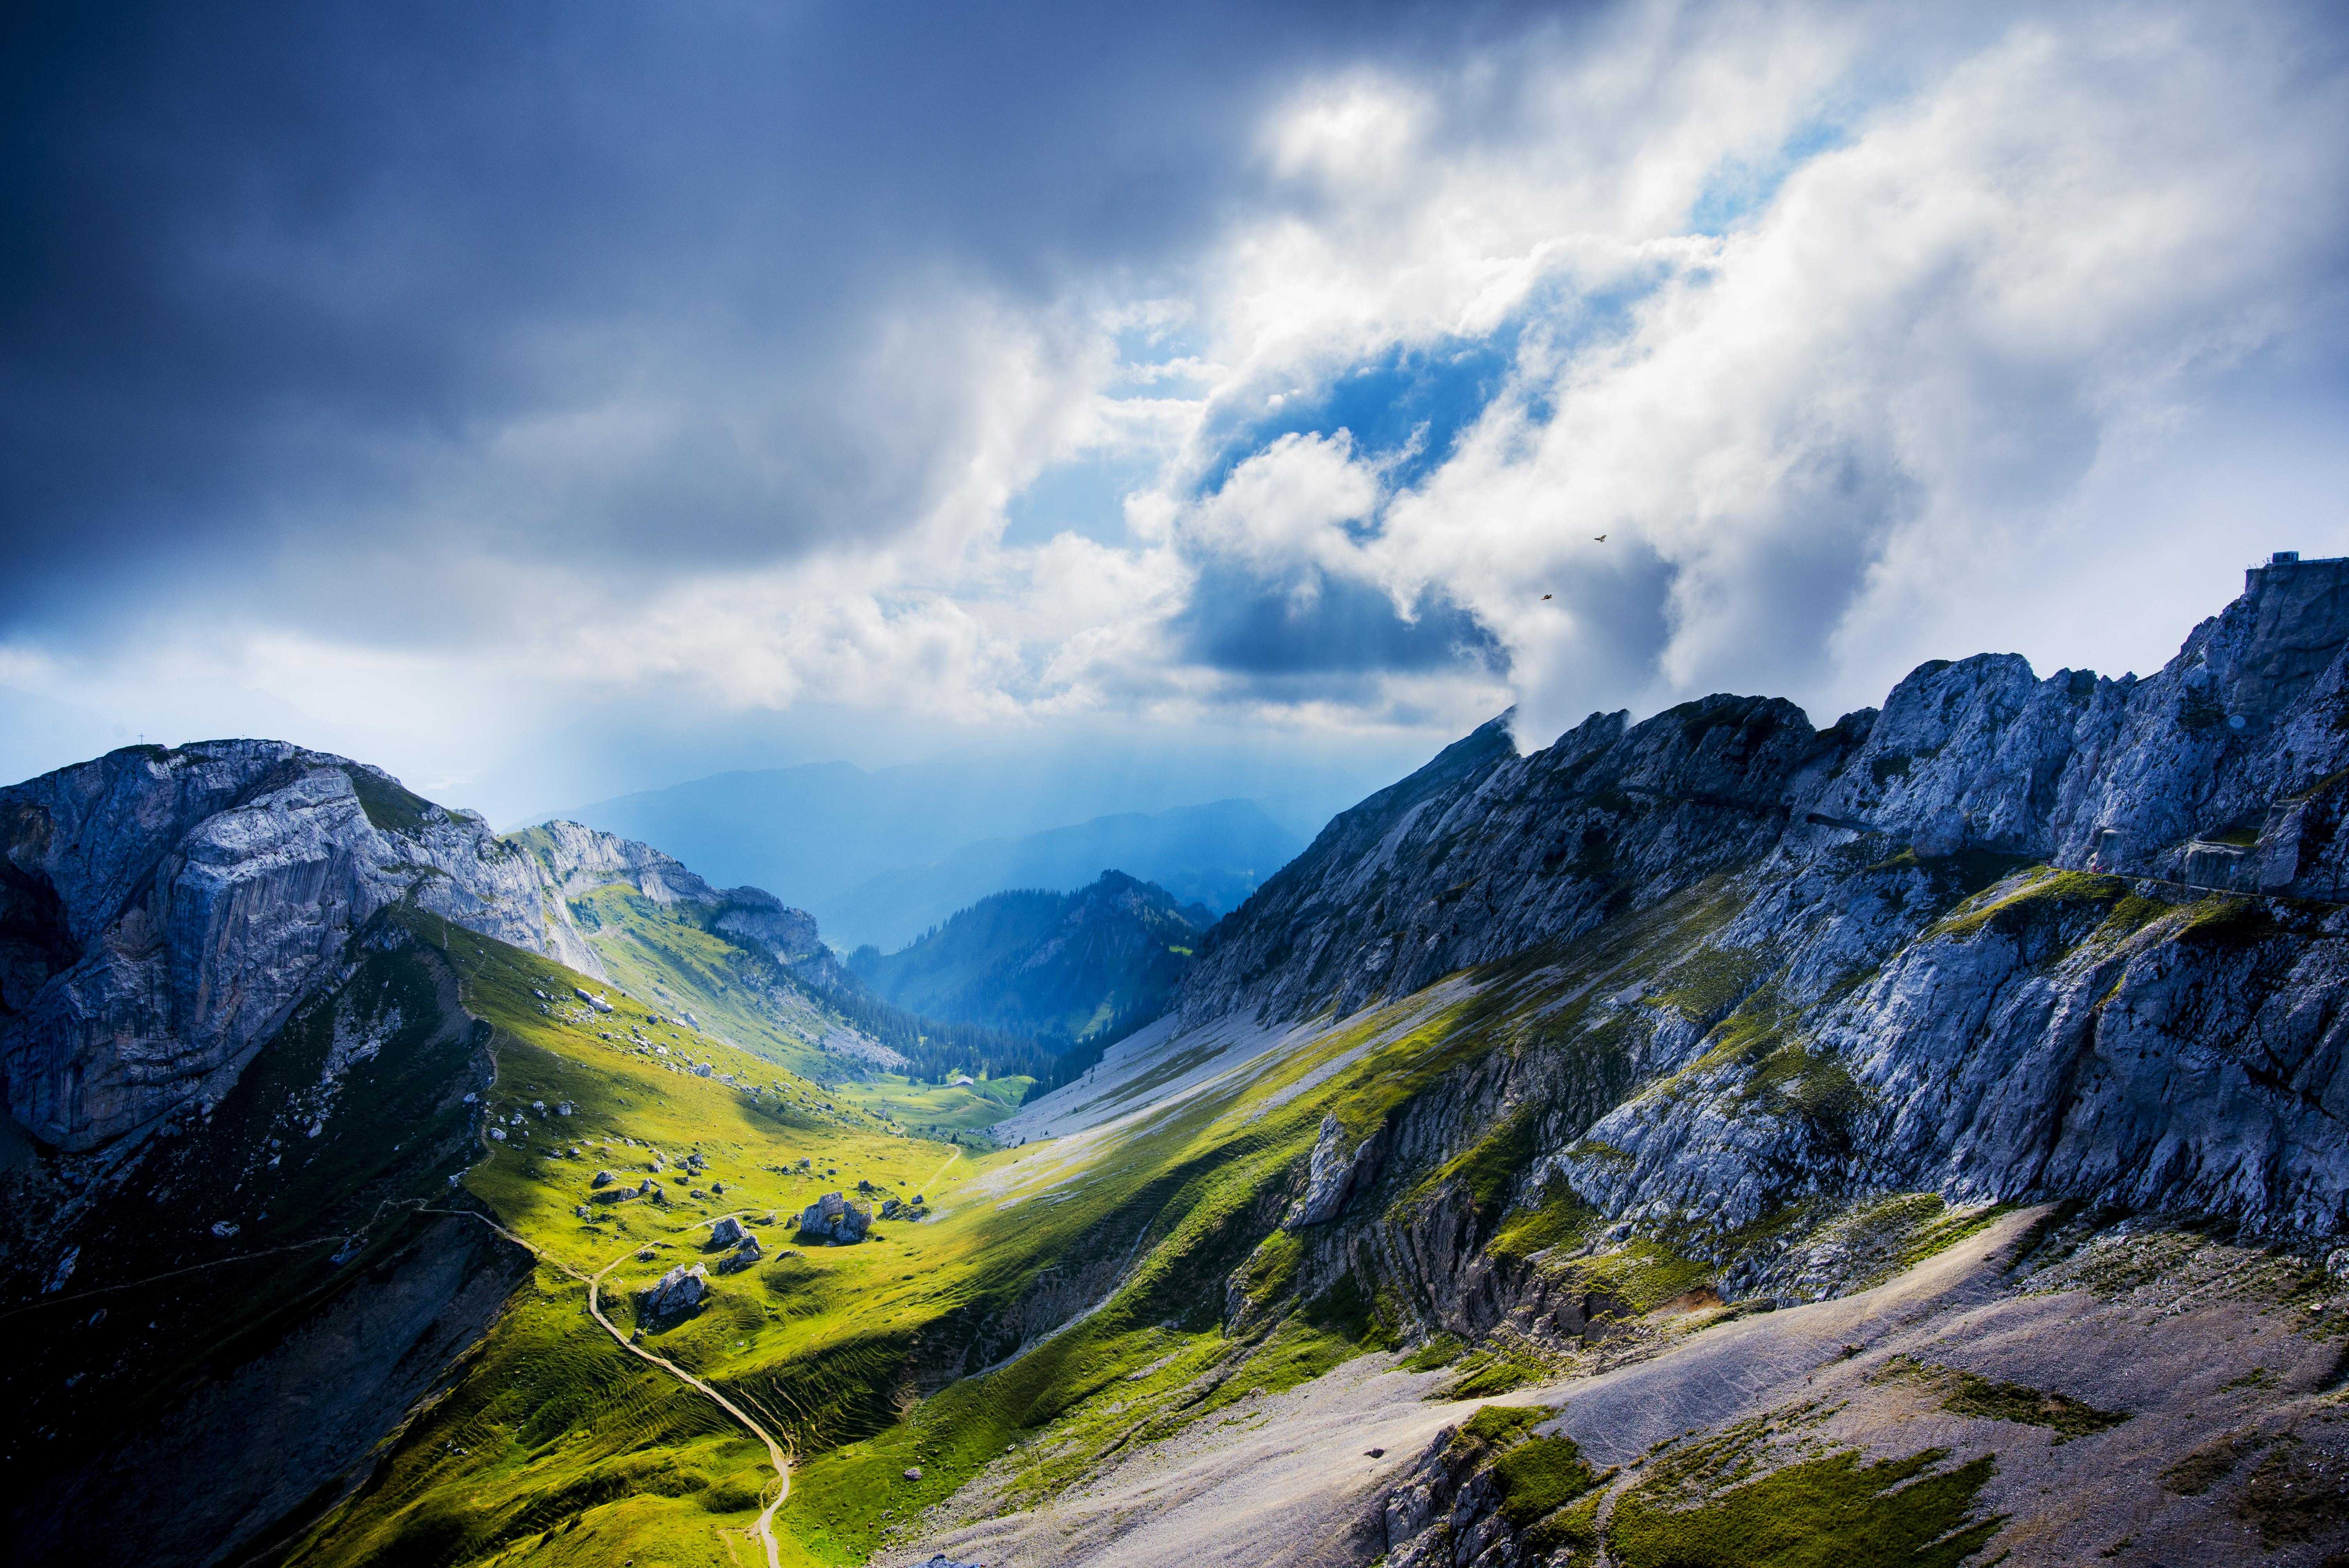 Mount Pilatus HD Wallpapers Backgrounds Wallpaper